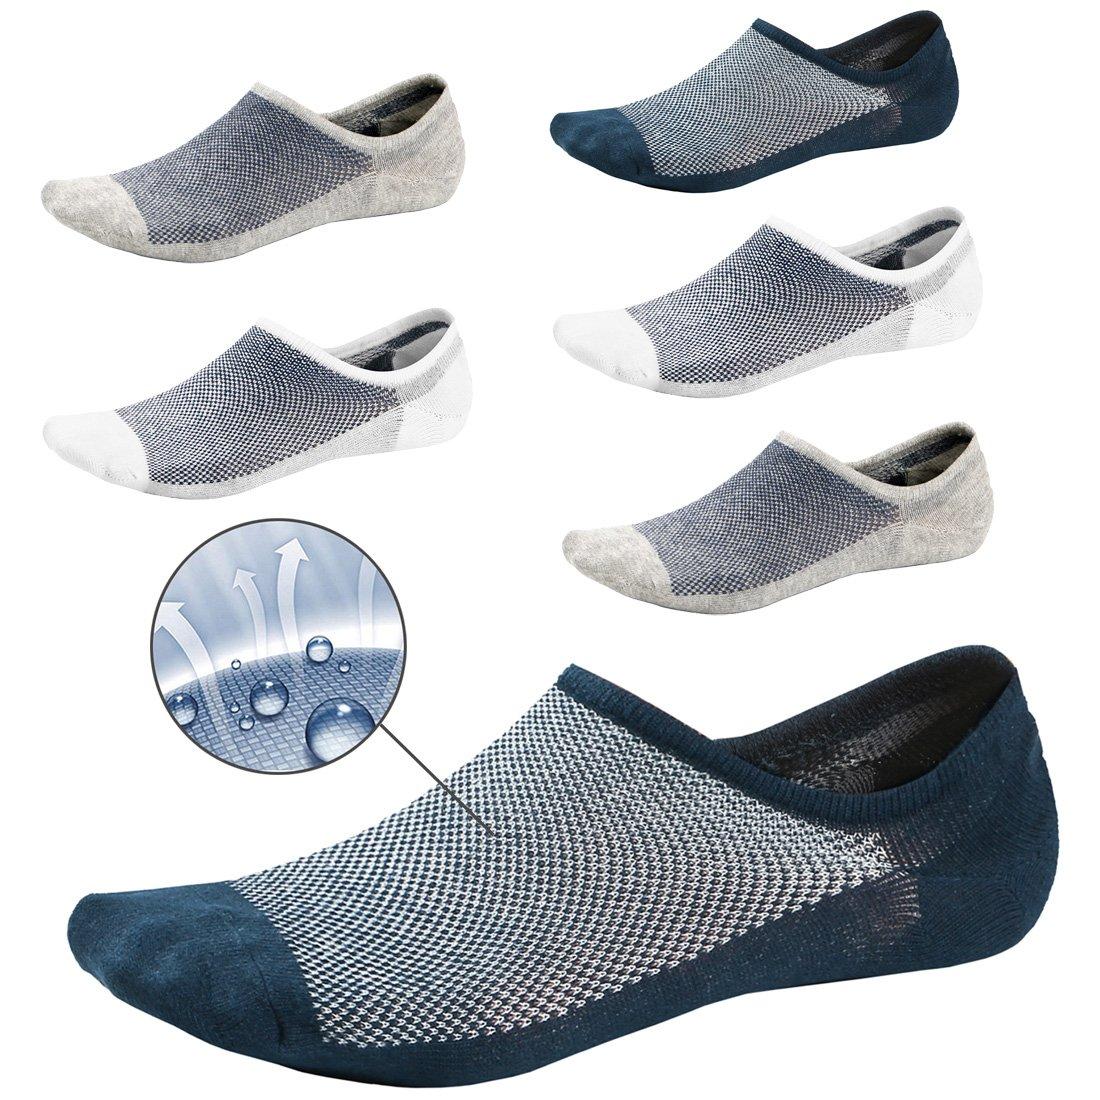 No Show Socks For Men 6Pack Non Slip Low Cut Liner Athletic Ankle Socks Cotton